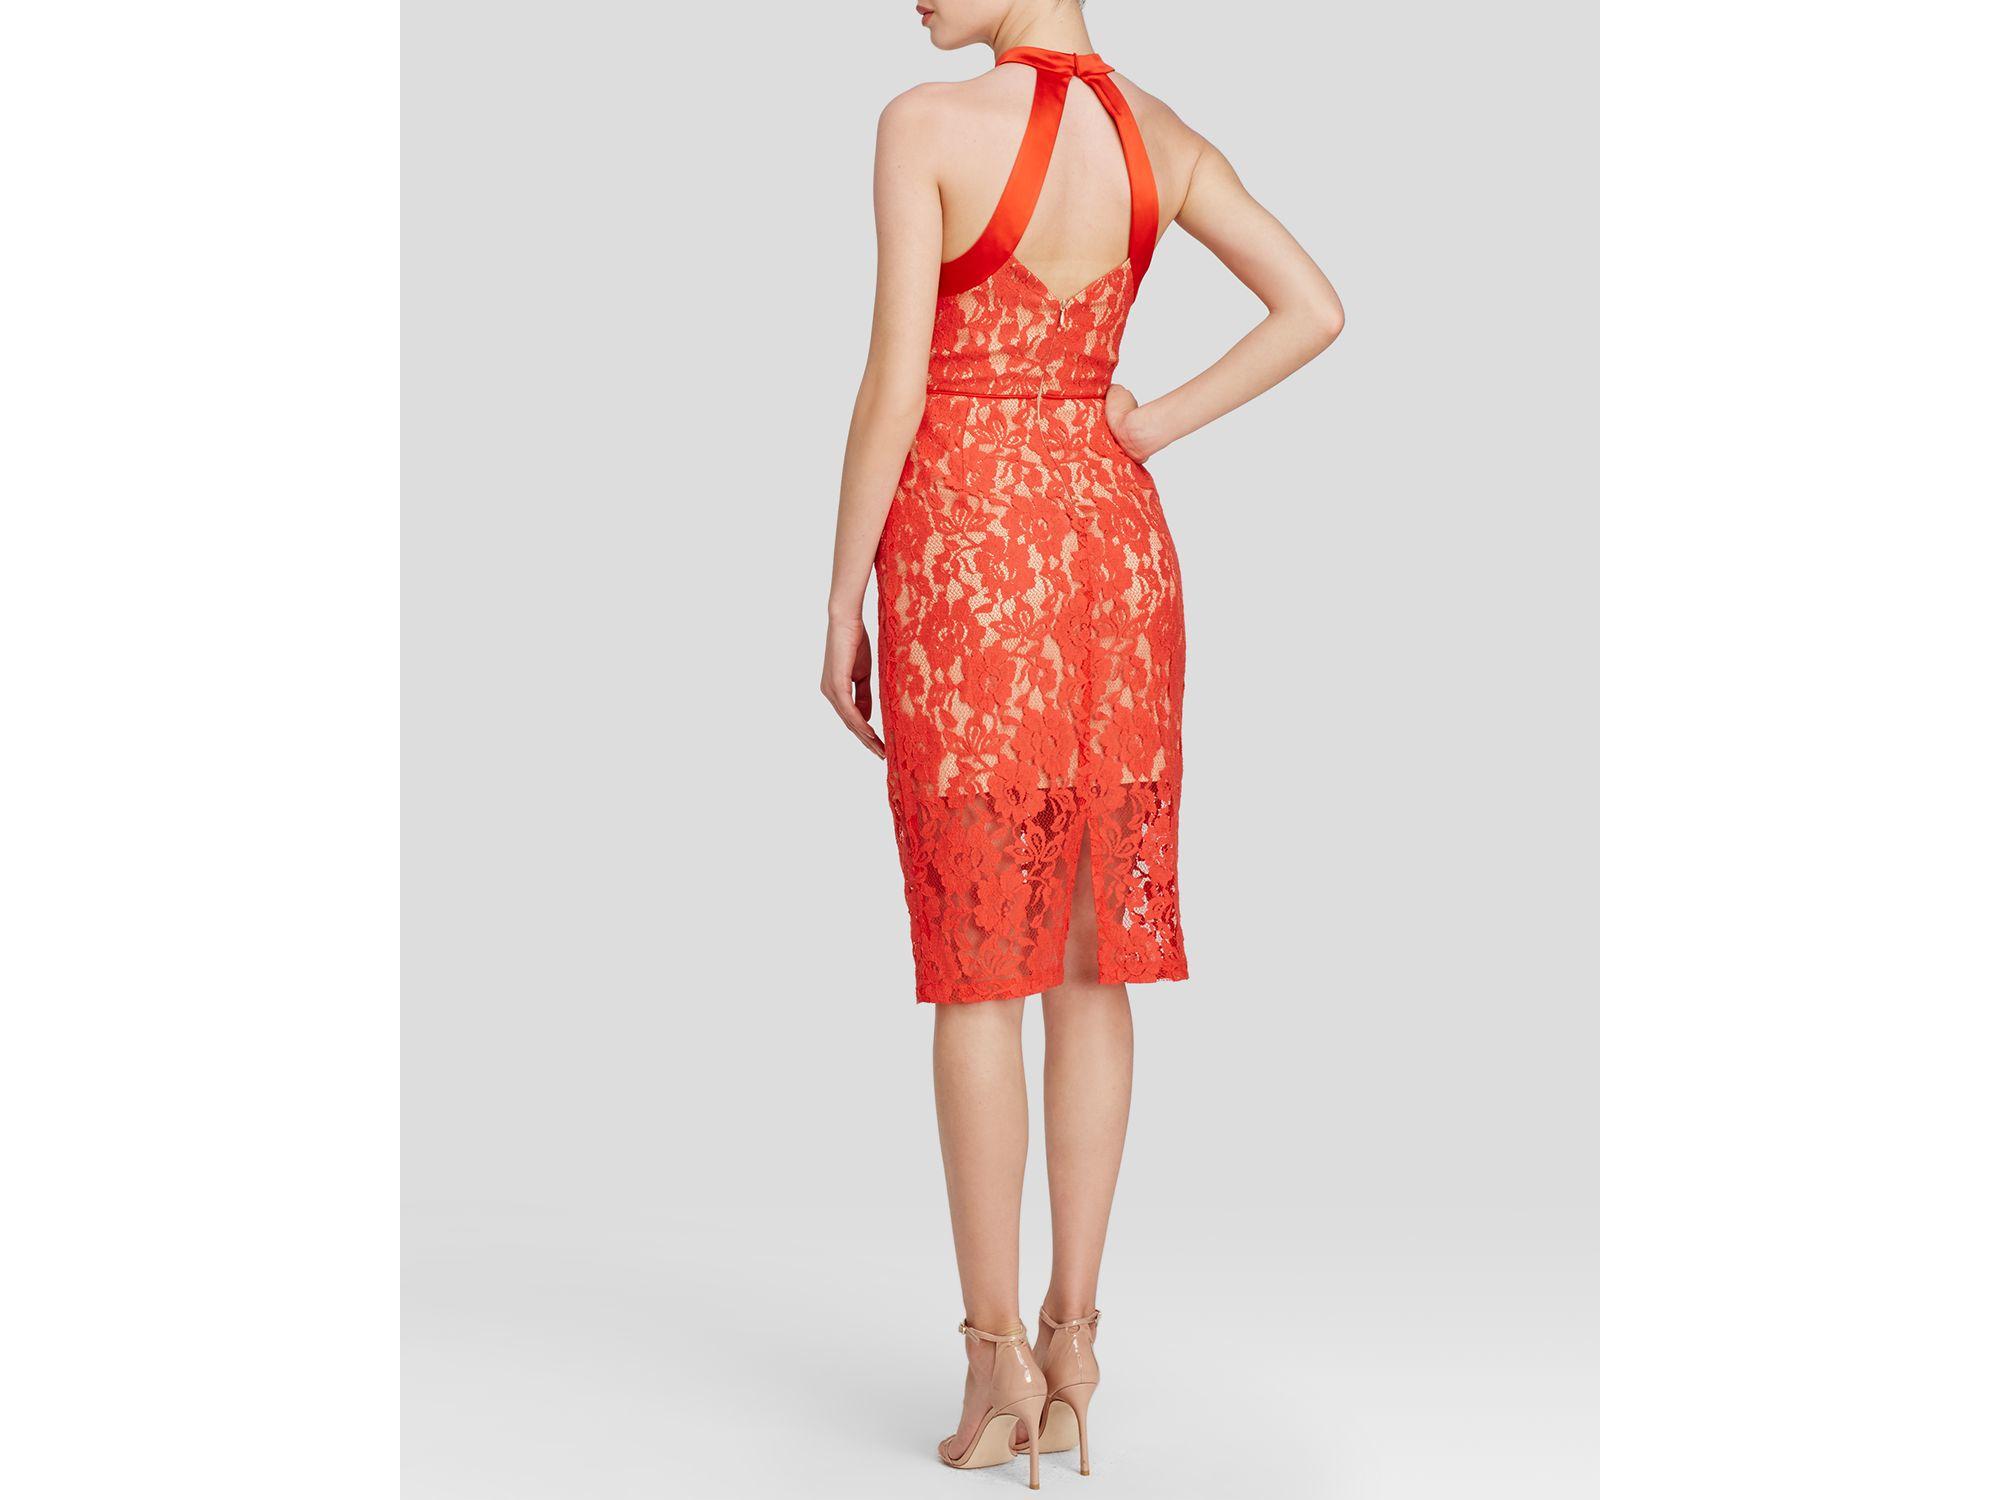 The Best Store To Get ABS by Allen Schwartz Sleeveless Mini Dress Cheap Footlocker Finishline Sast Cheap Online Free Shipping Eastbay Clearance Sast 4EZTvp47U